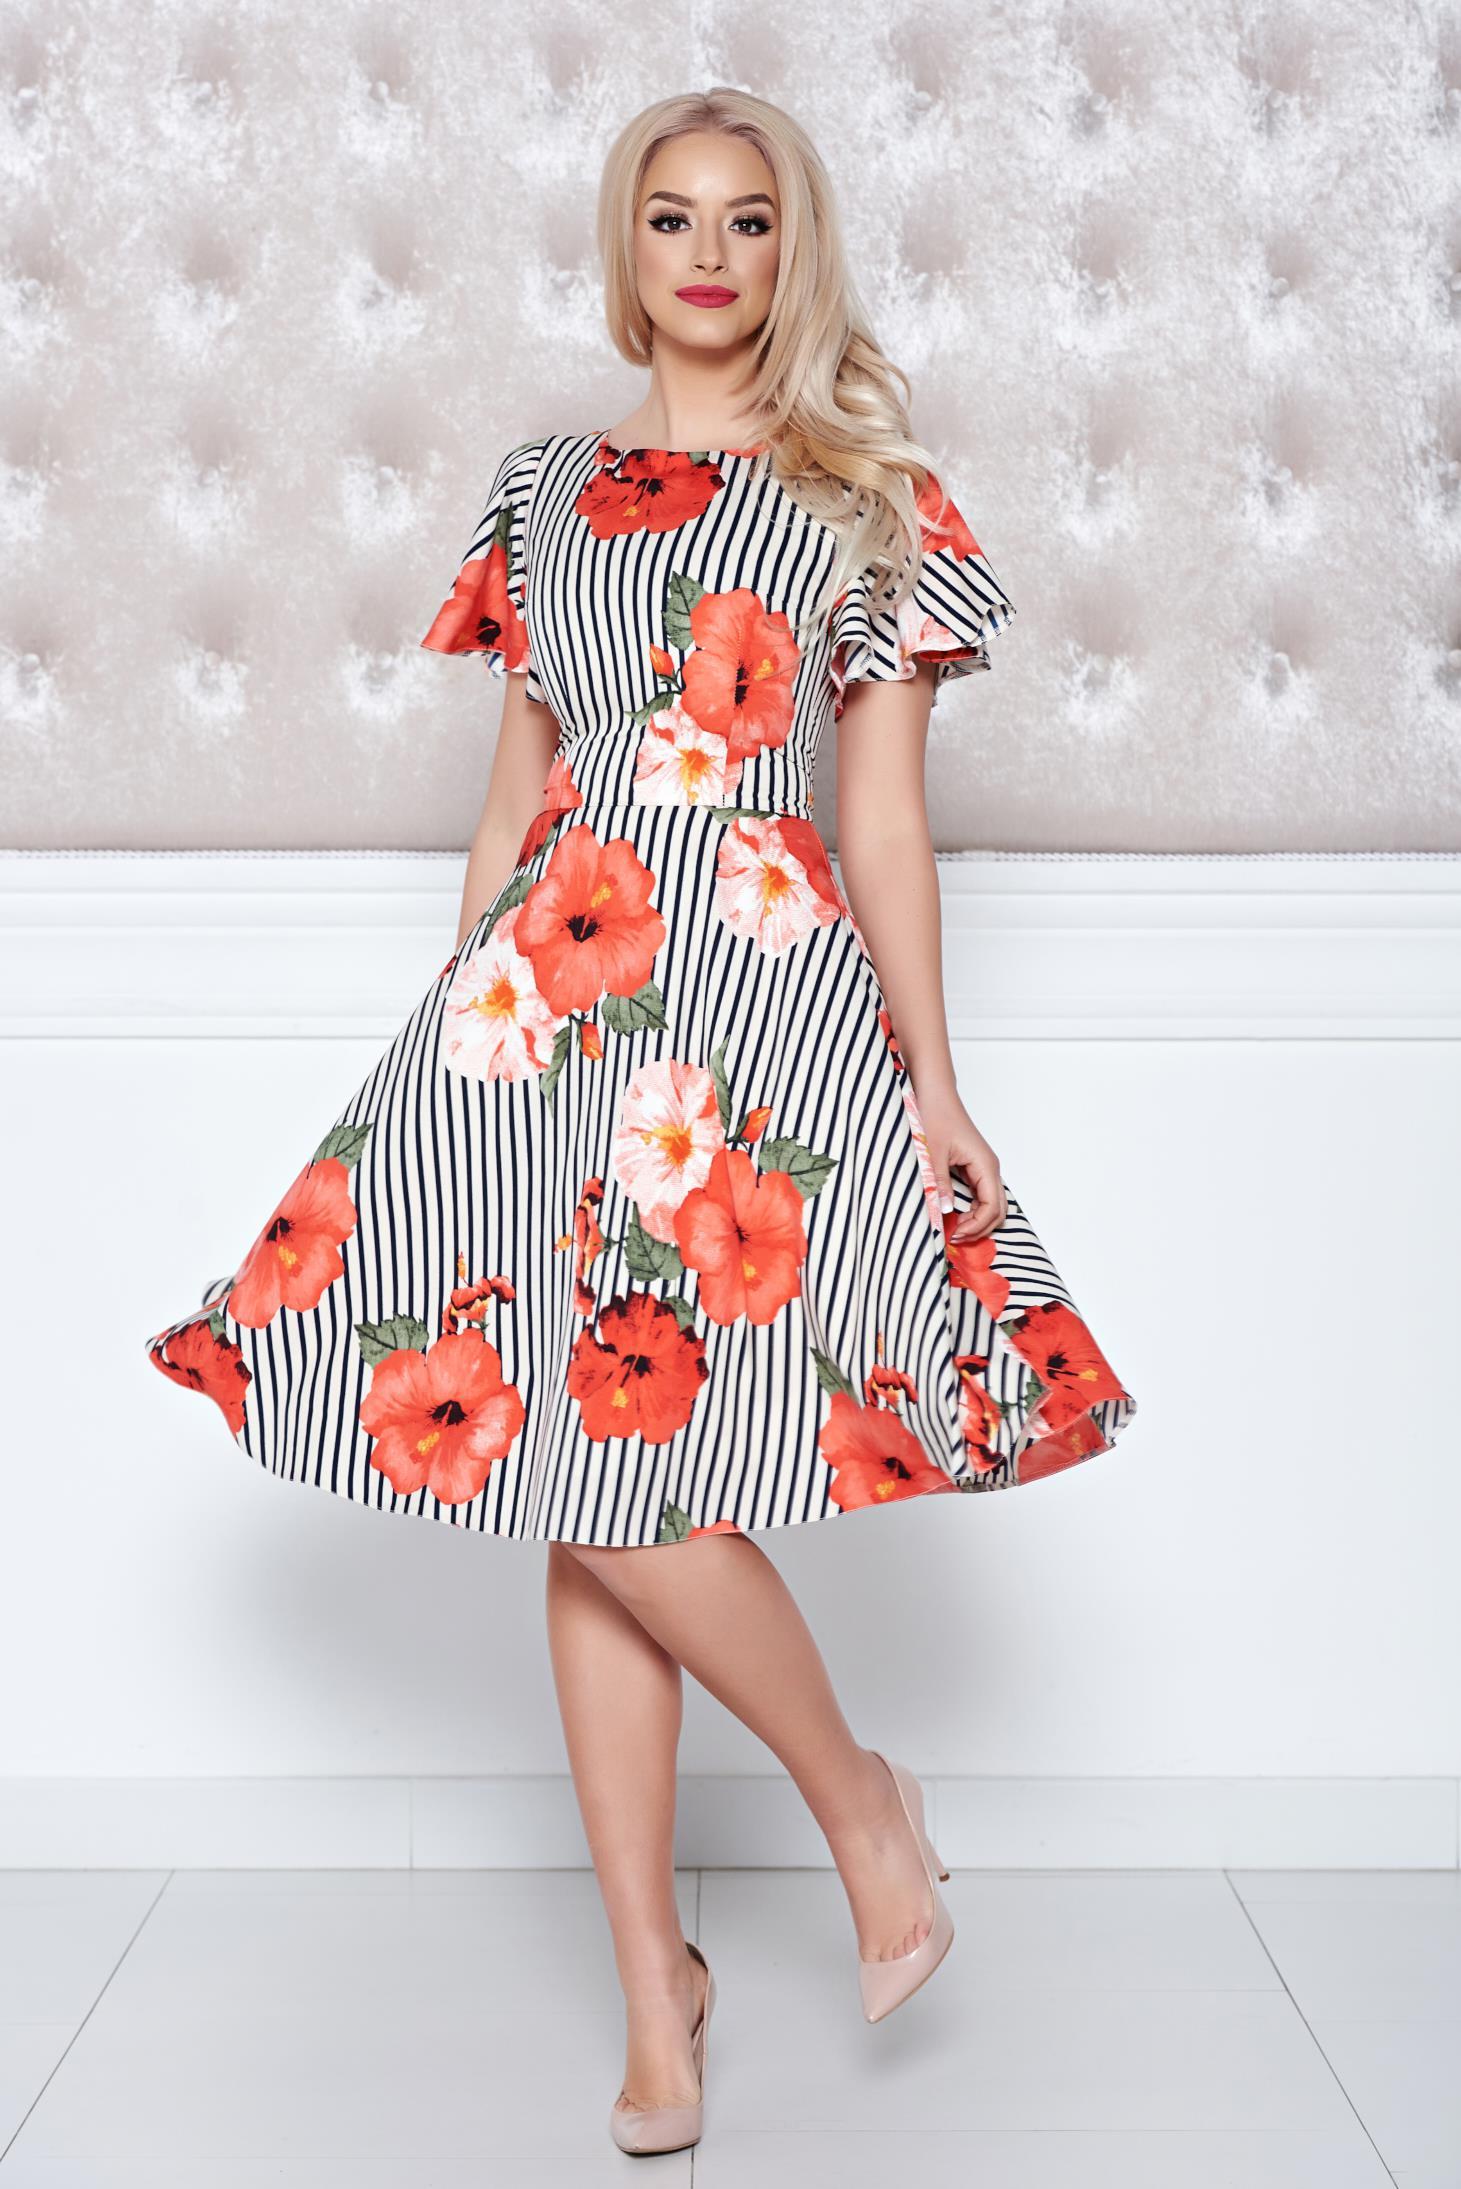 "Image result for photos of koral color fashion dresses"""